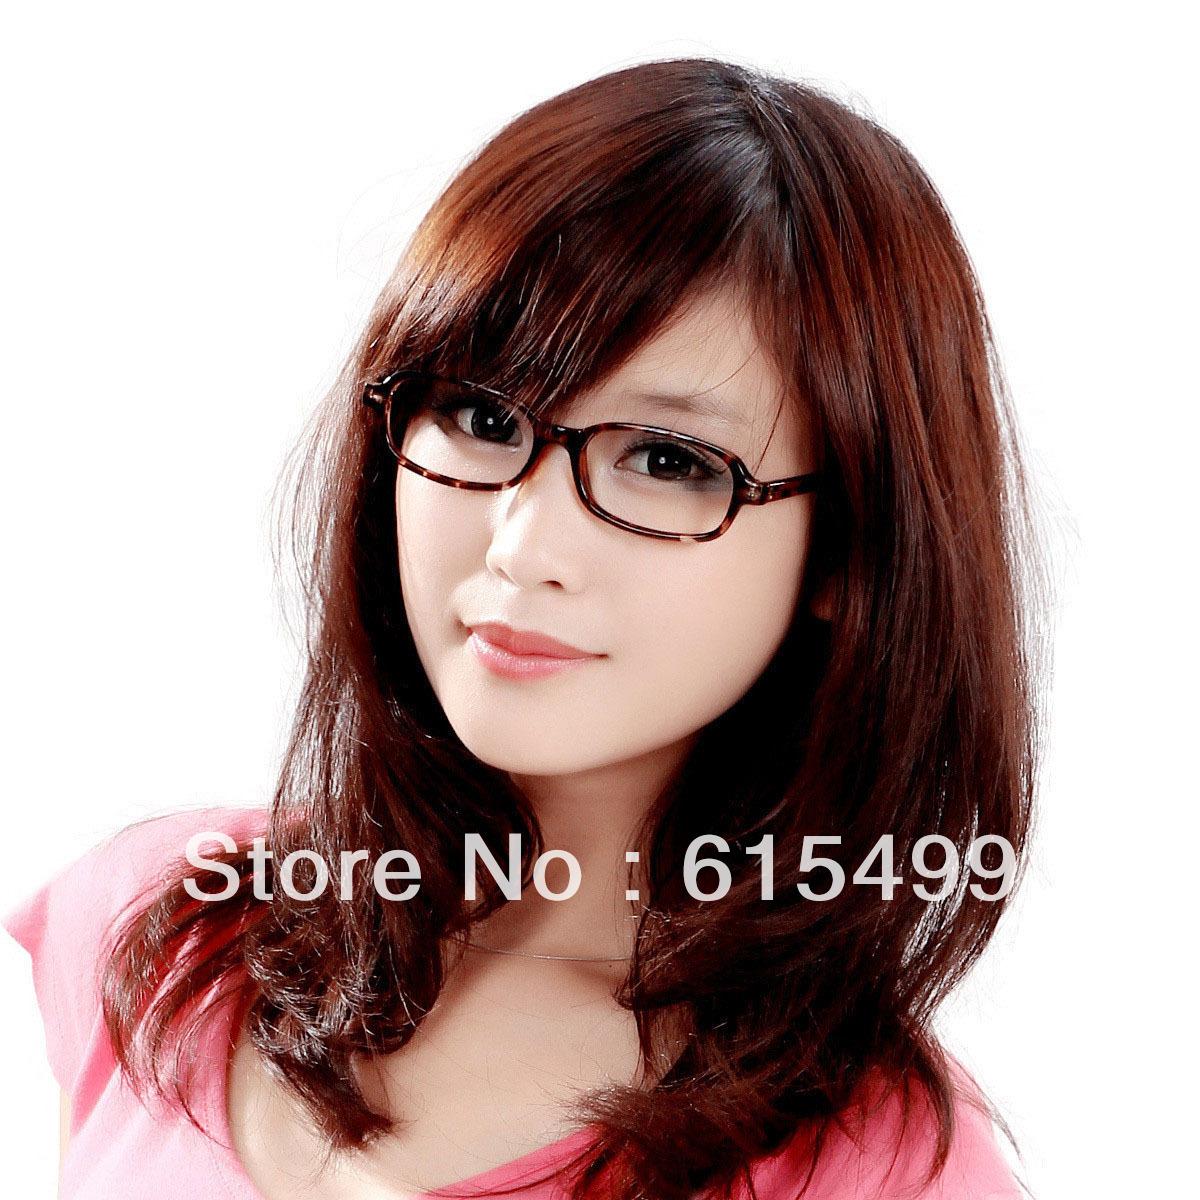 rimless eyeglass frames 0rg0  rimless eyeglass frames